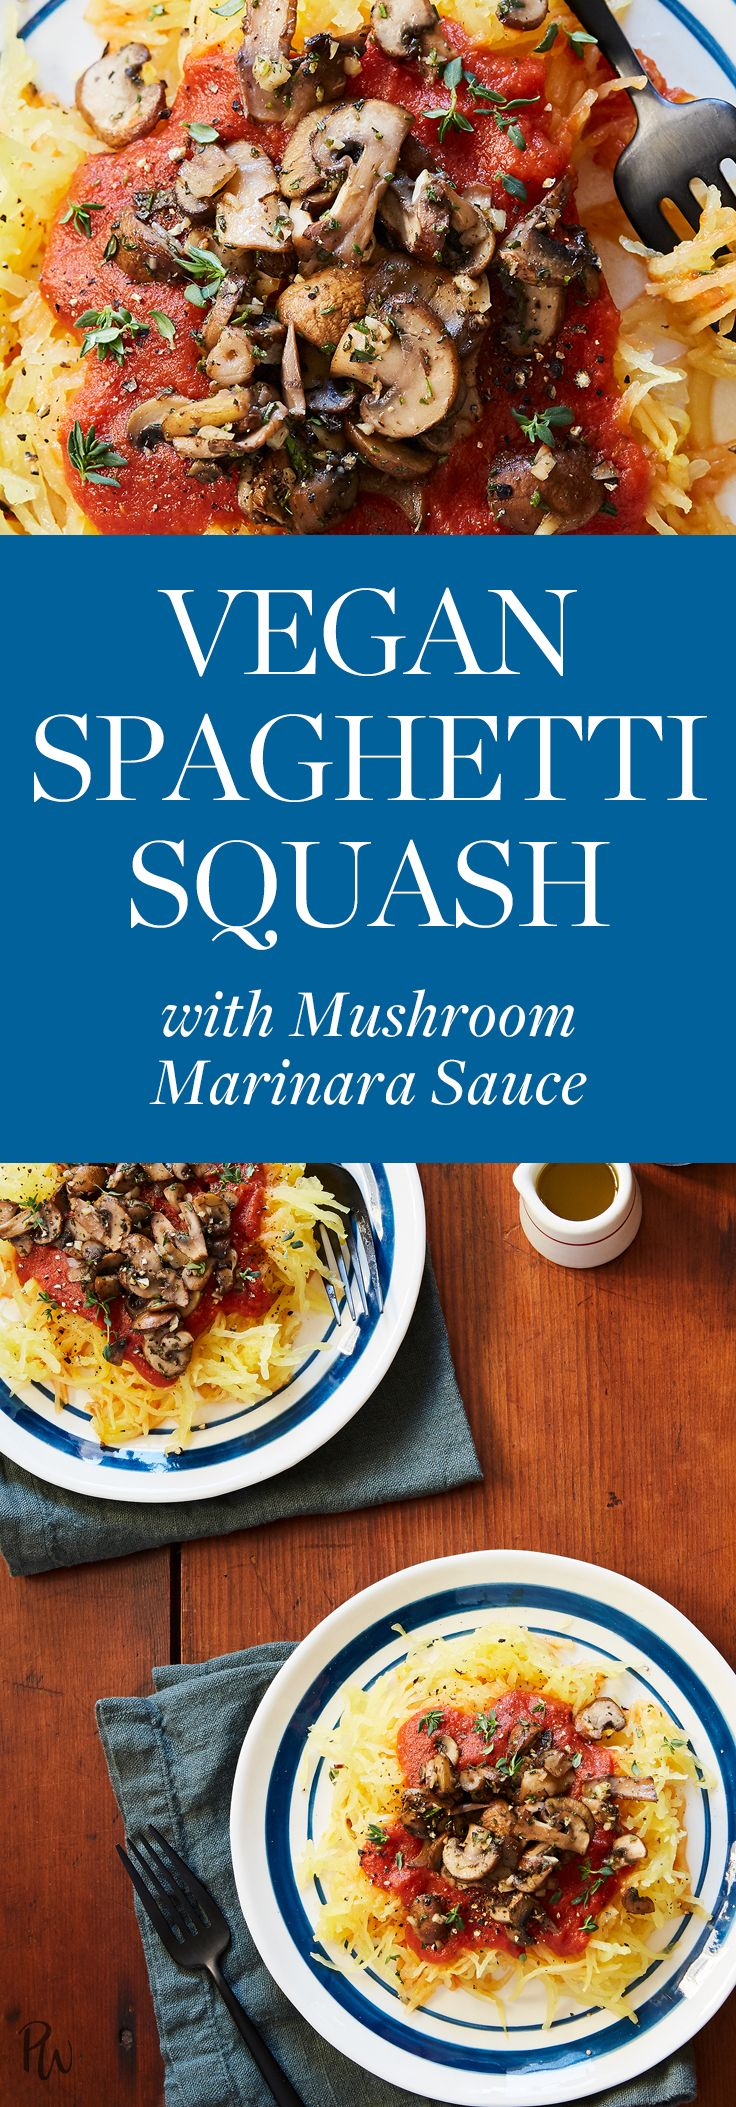 Vegan Spaghetti Squash With Mushroom Marinara Sauce